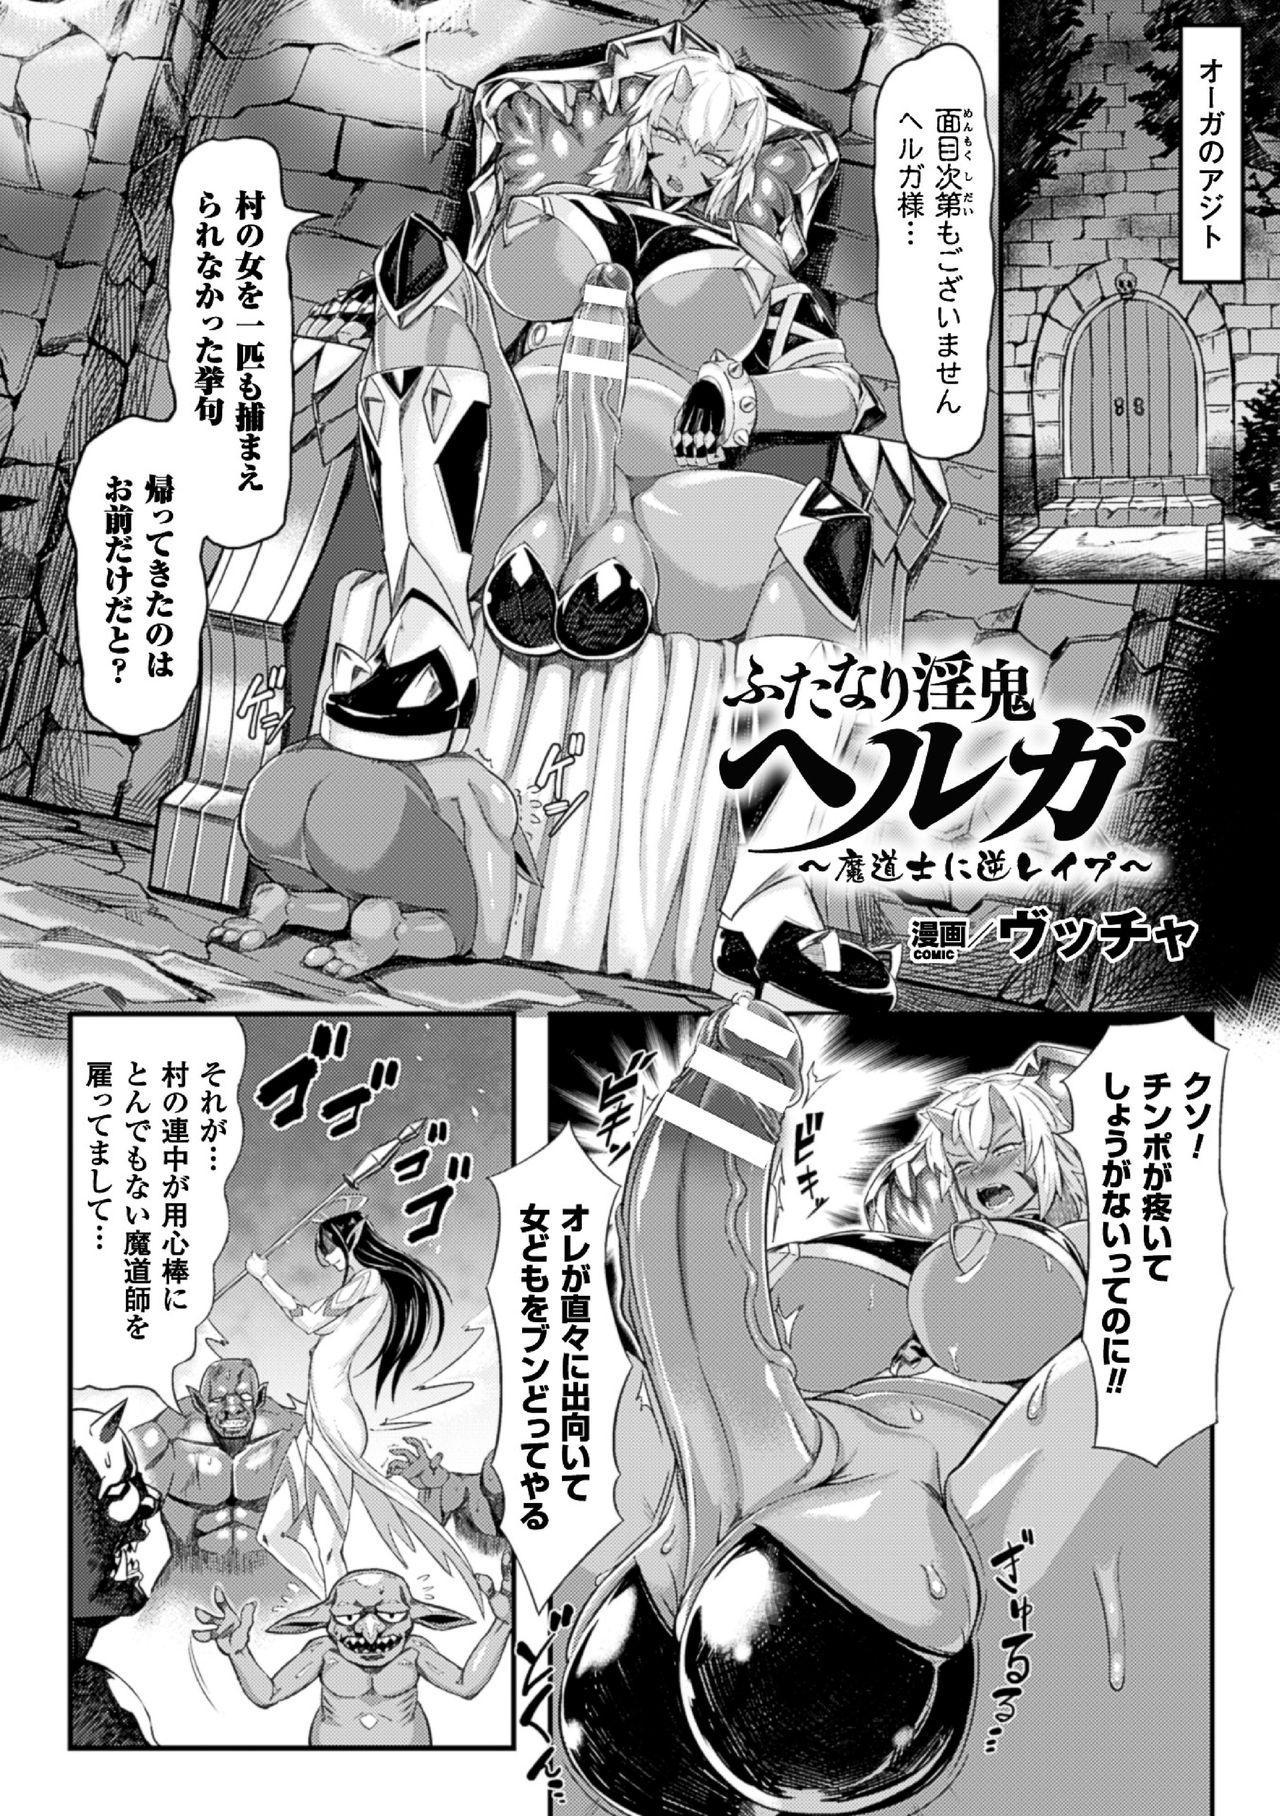 2D Comic Magazine Futanari Musume ni Nakadashi Haramase! Vol. 1 4